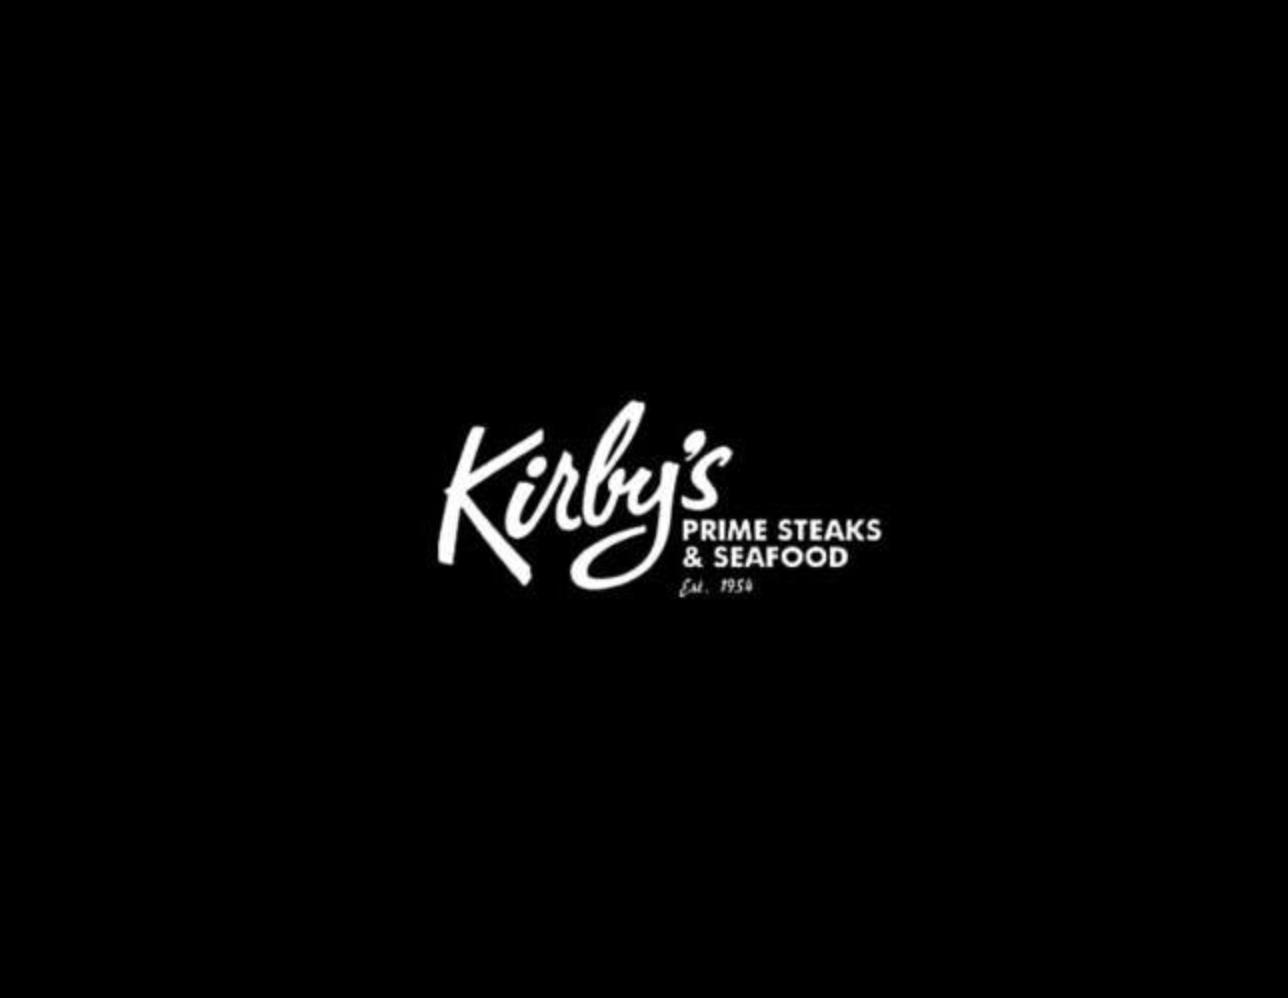 Kirby's Steakhouse , Dinner  123 N. Loop 1604 E., San Antonio, 78232  P 210-404-2221    Kirby's Dinner Menu      Make a Reservation on OpenTable